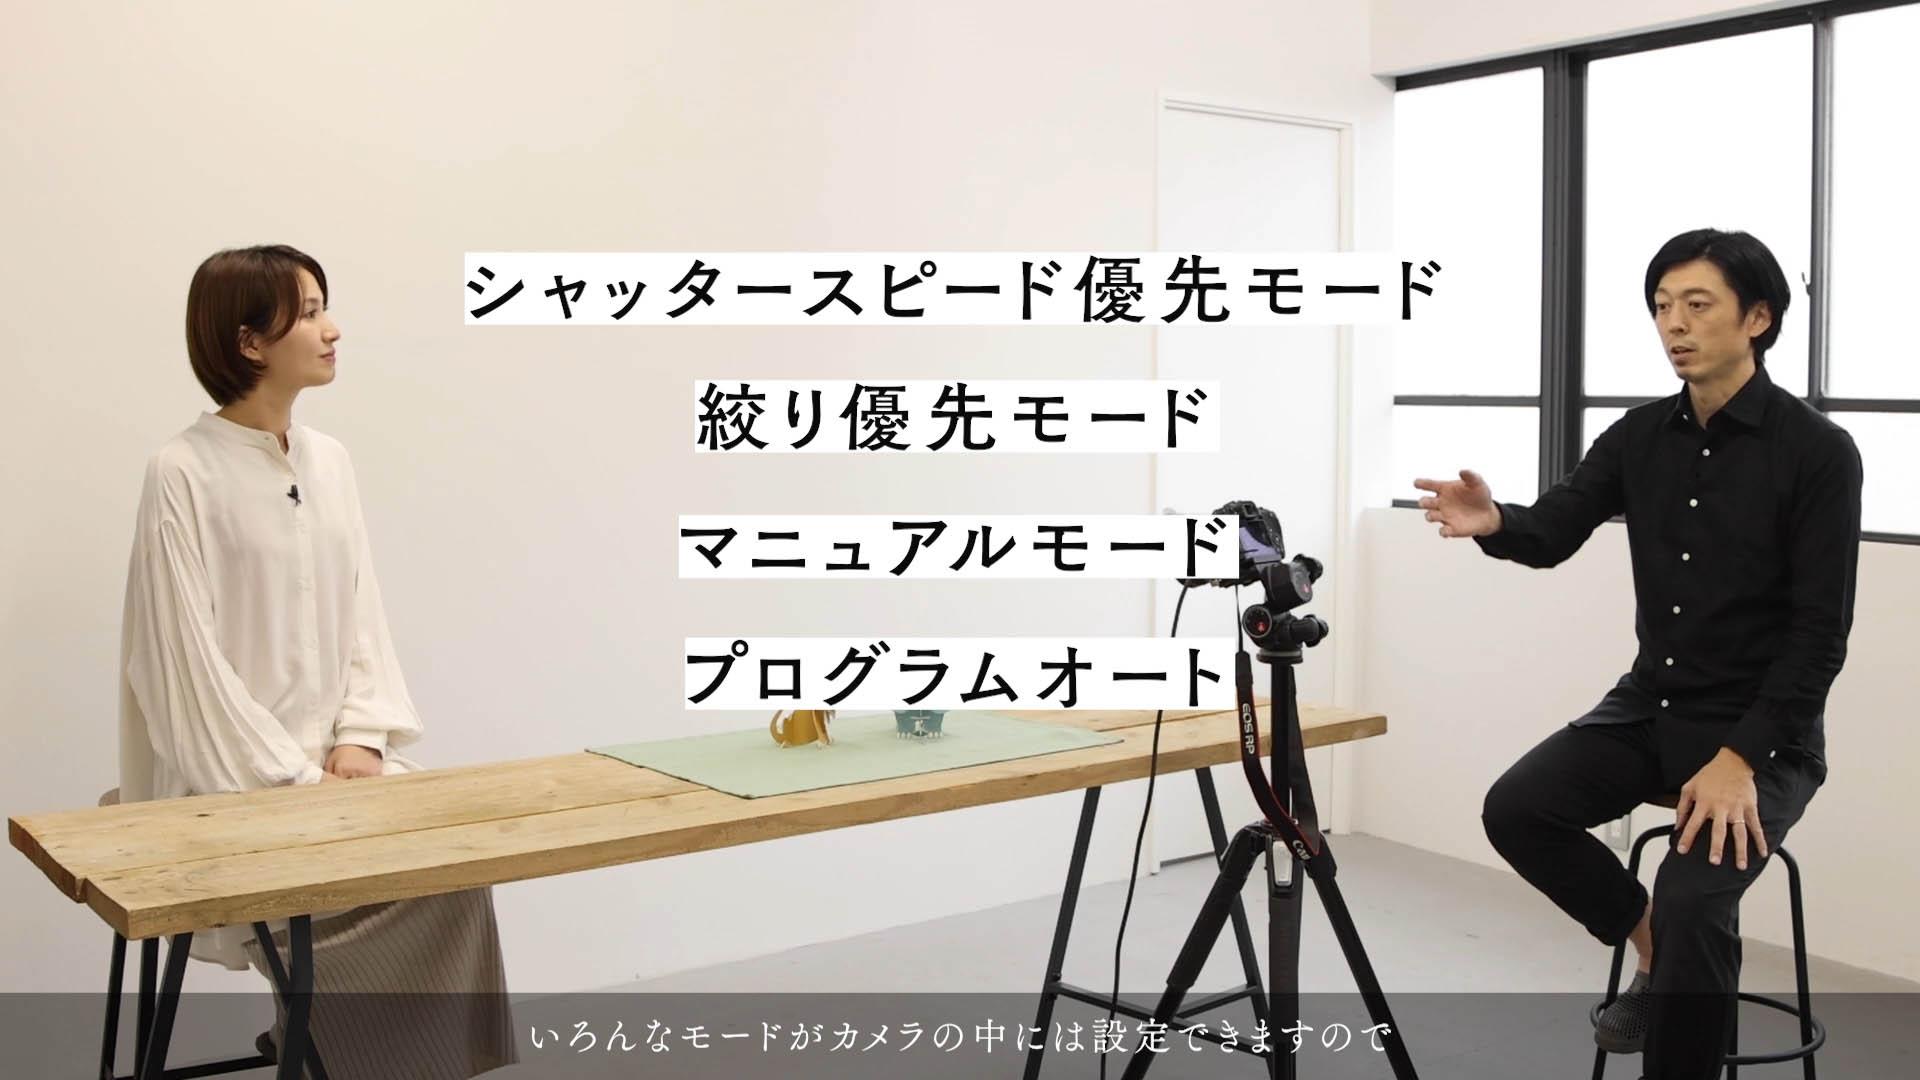 【C-020】撮影モードごとの特徴を学ぶ